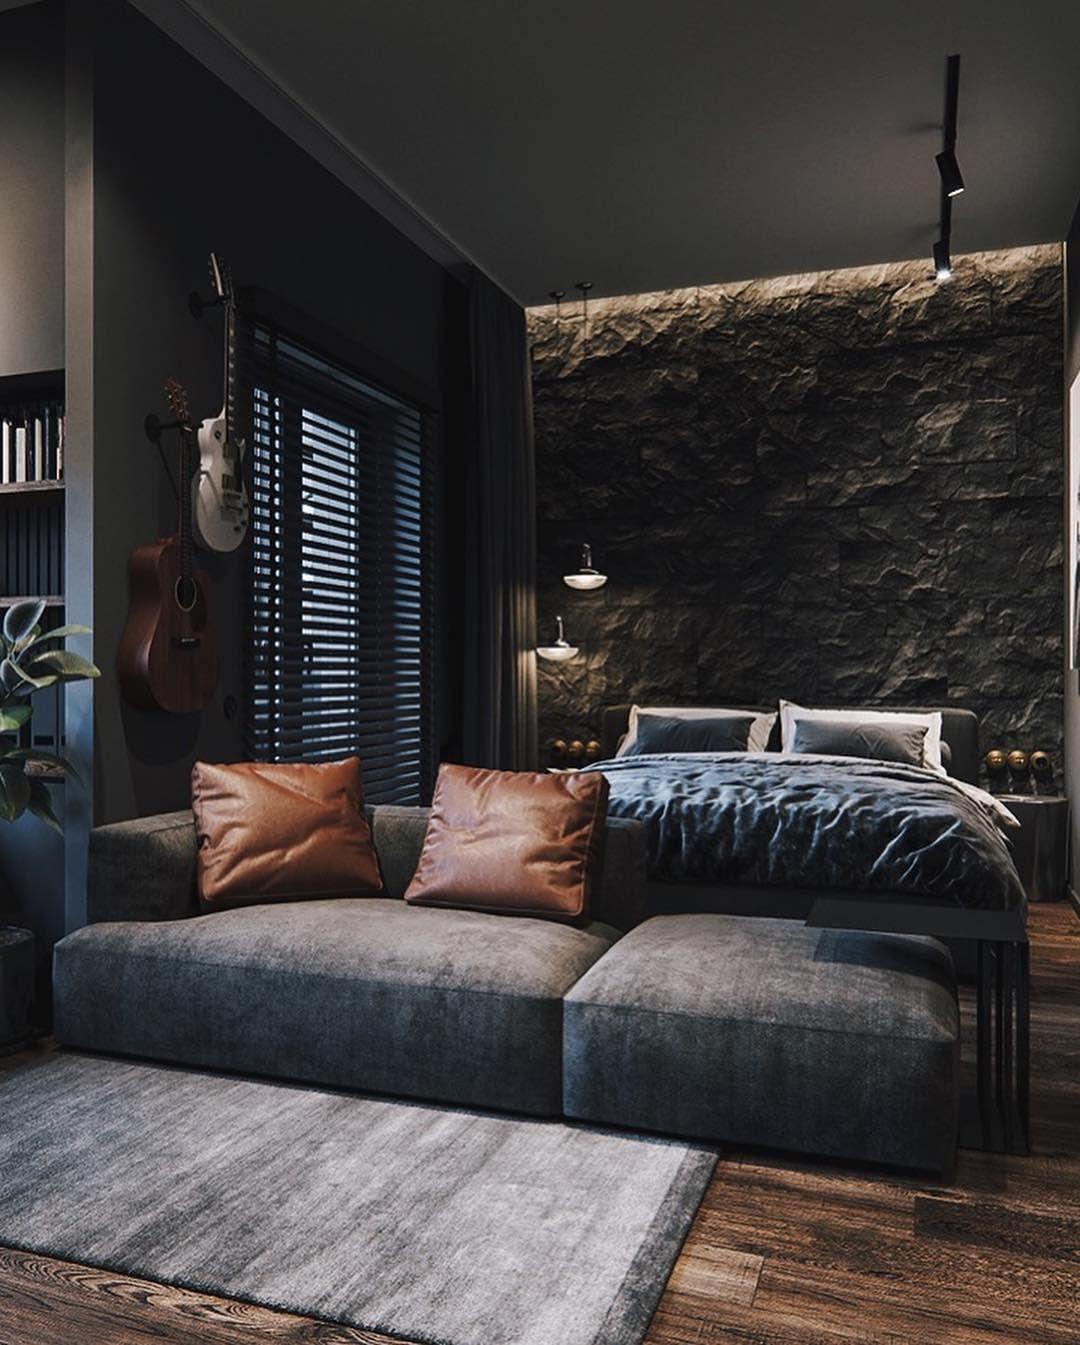 "iSetups on Instagram: ""Blacked-Out Bedroom 💣 📸: @skar.design""  La imagen puede contener: personas sentadas, sala de estar e interior  #Bedroom #BlackedOut #Instagram #iSetups #skardesign"